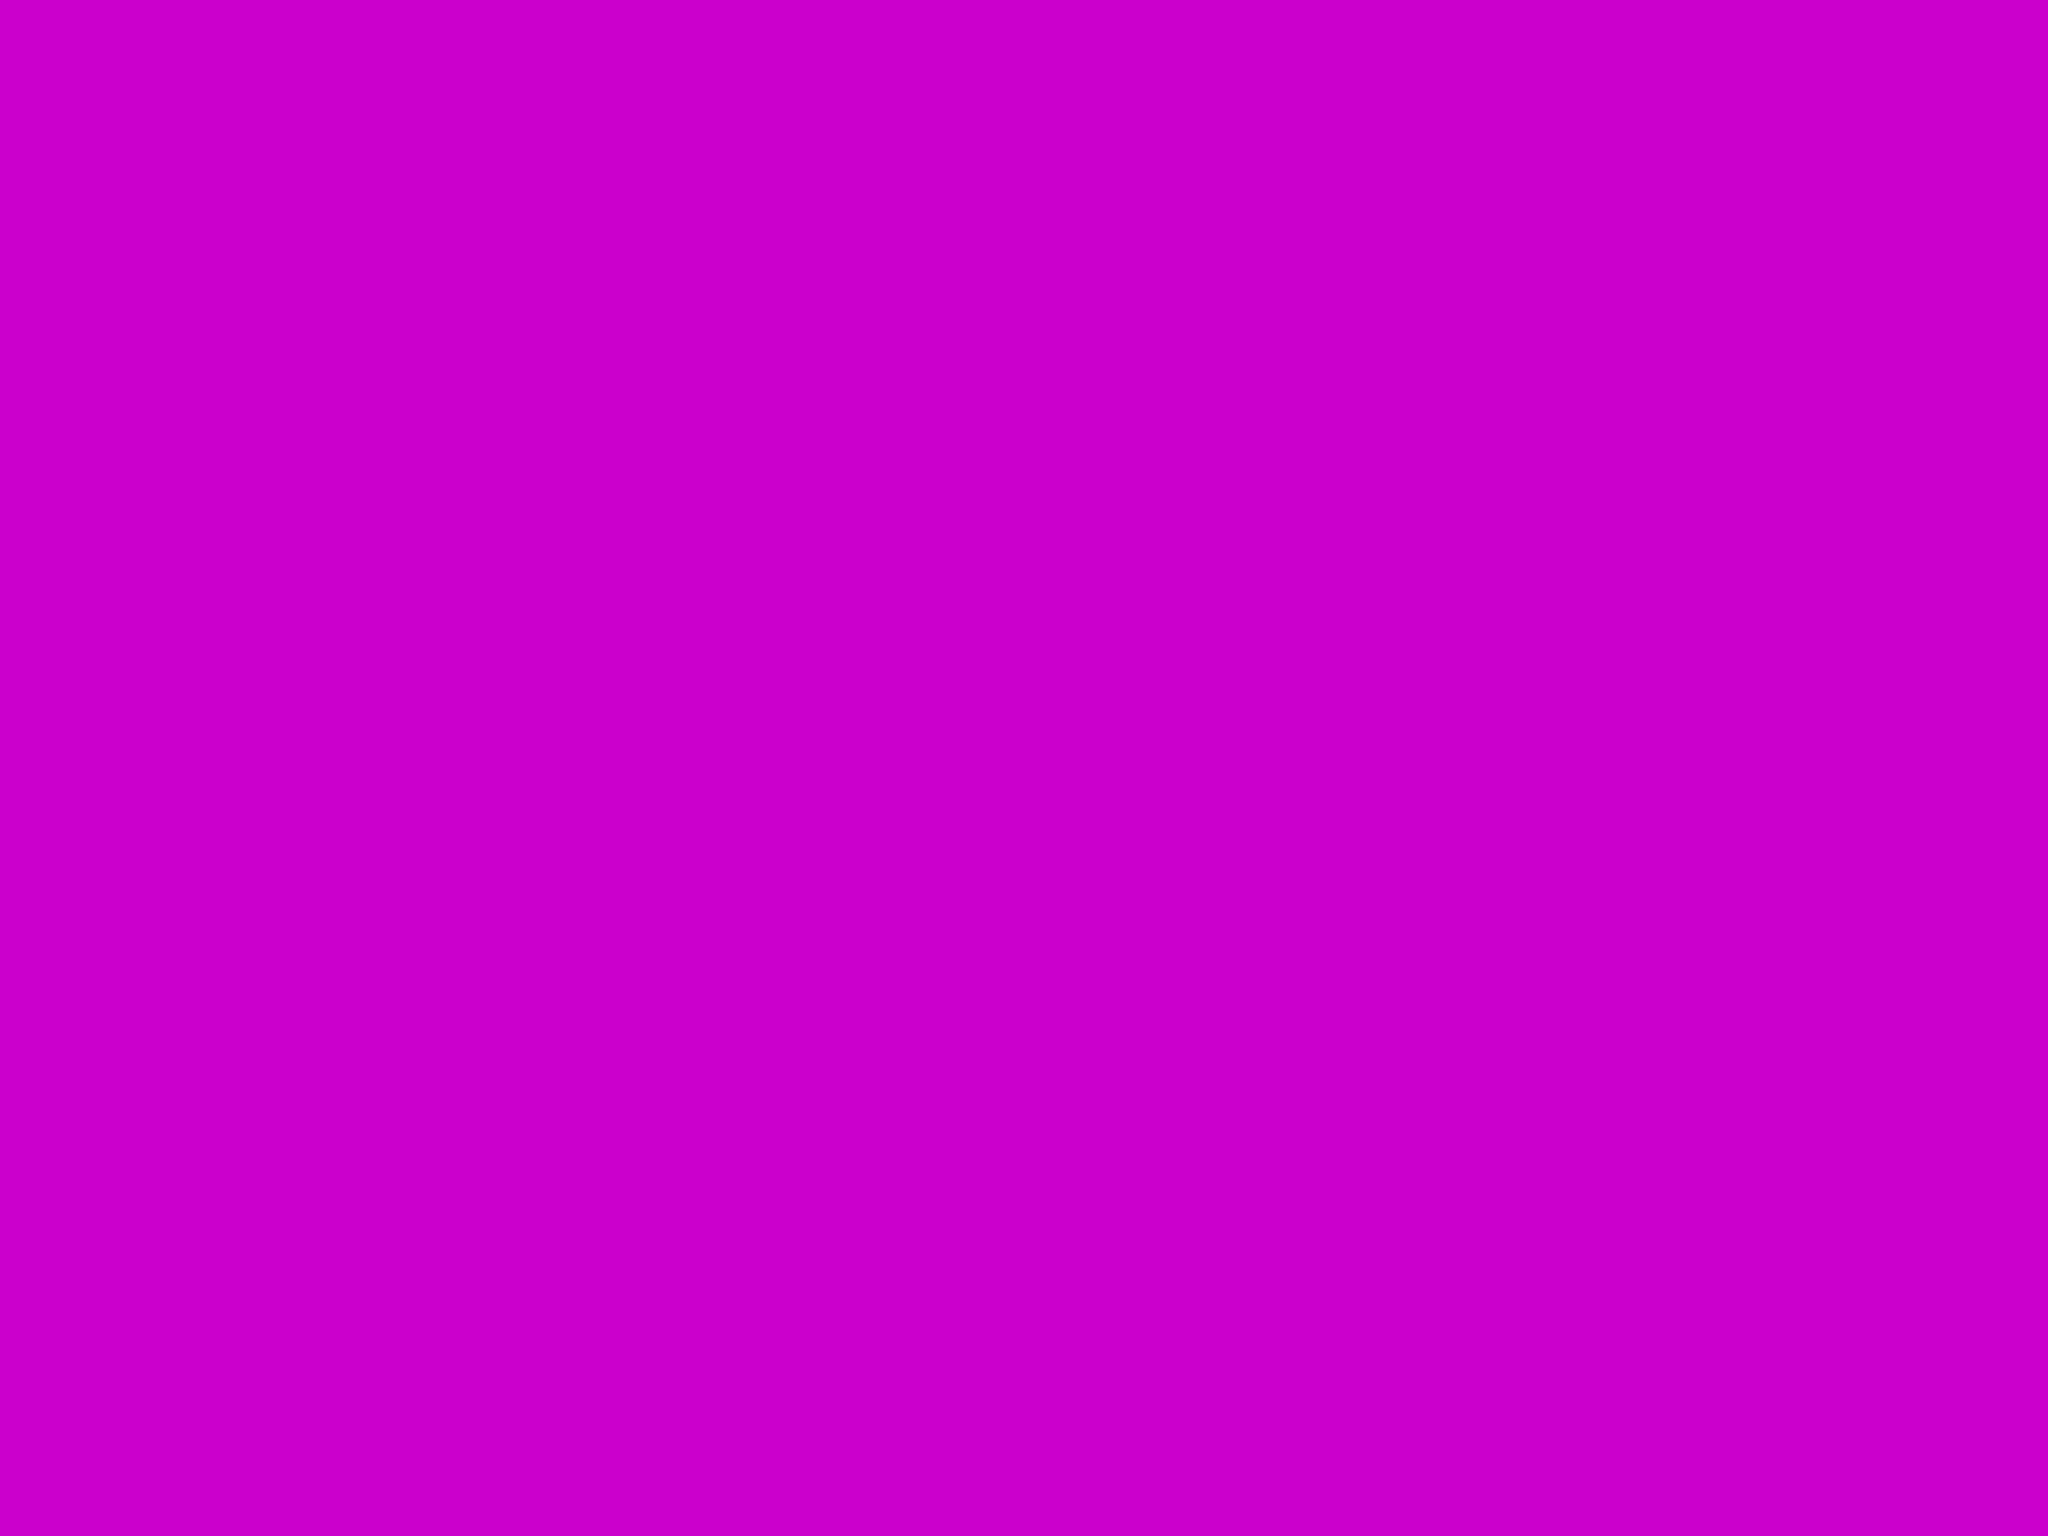 2048x1536 Deep Magenta Solid Color Background